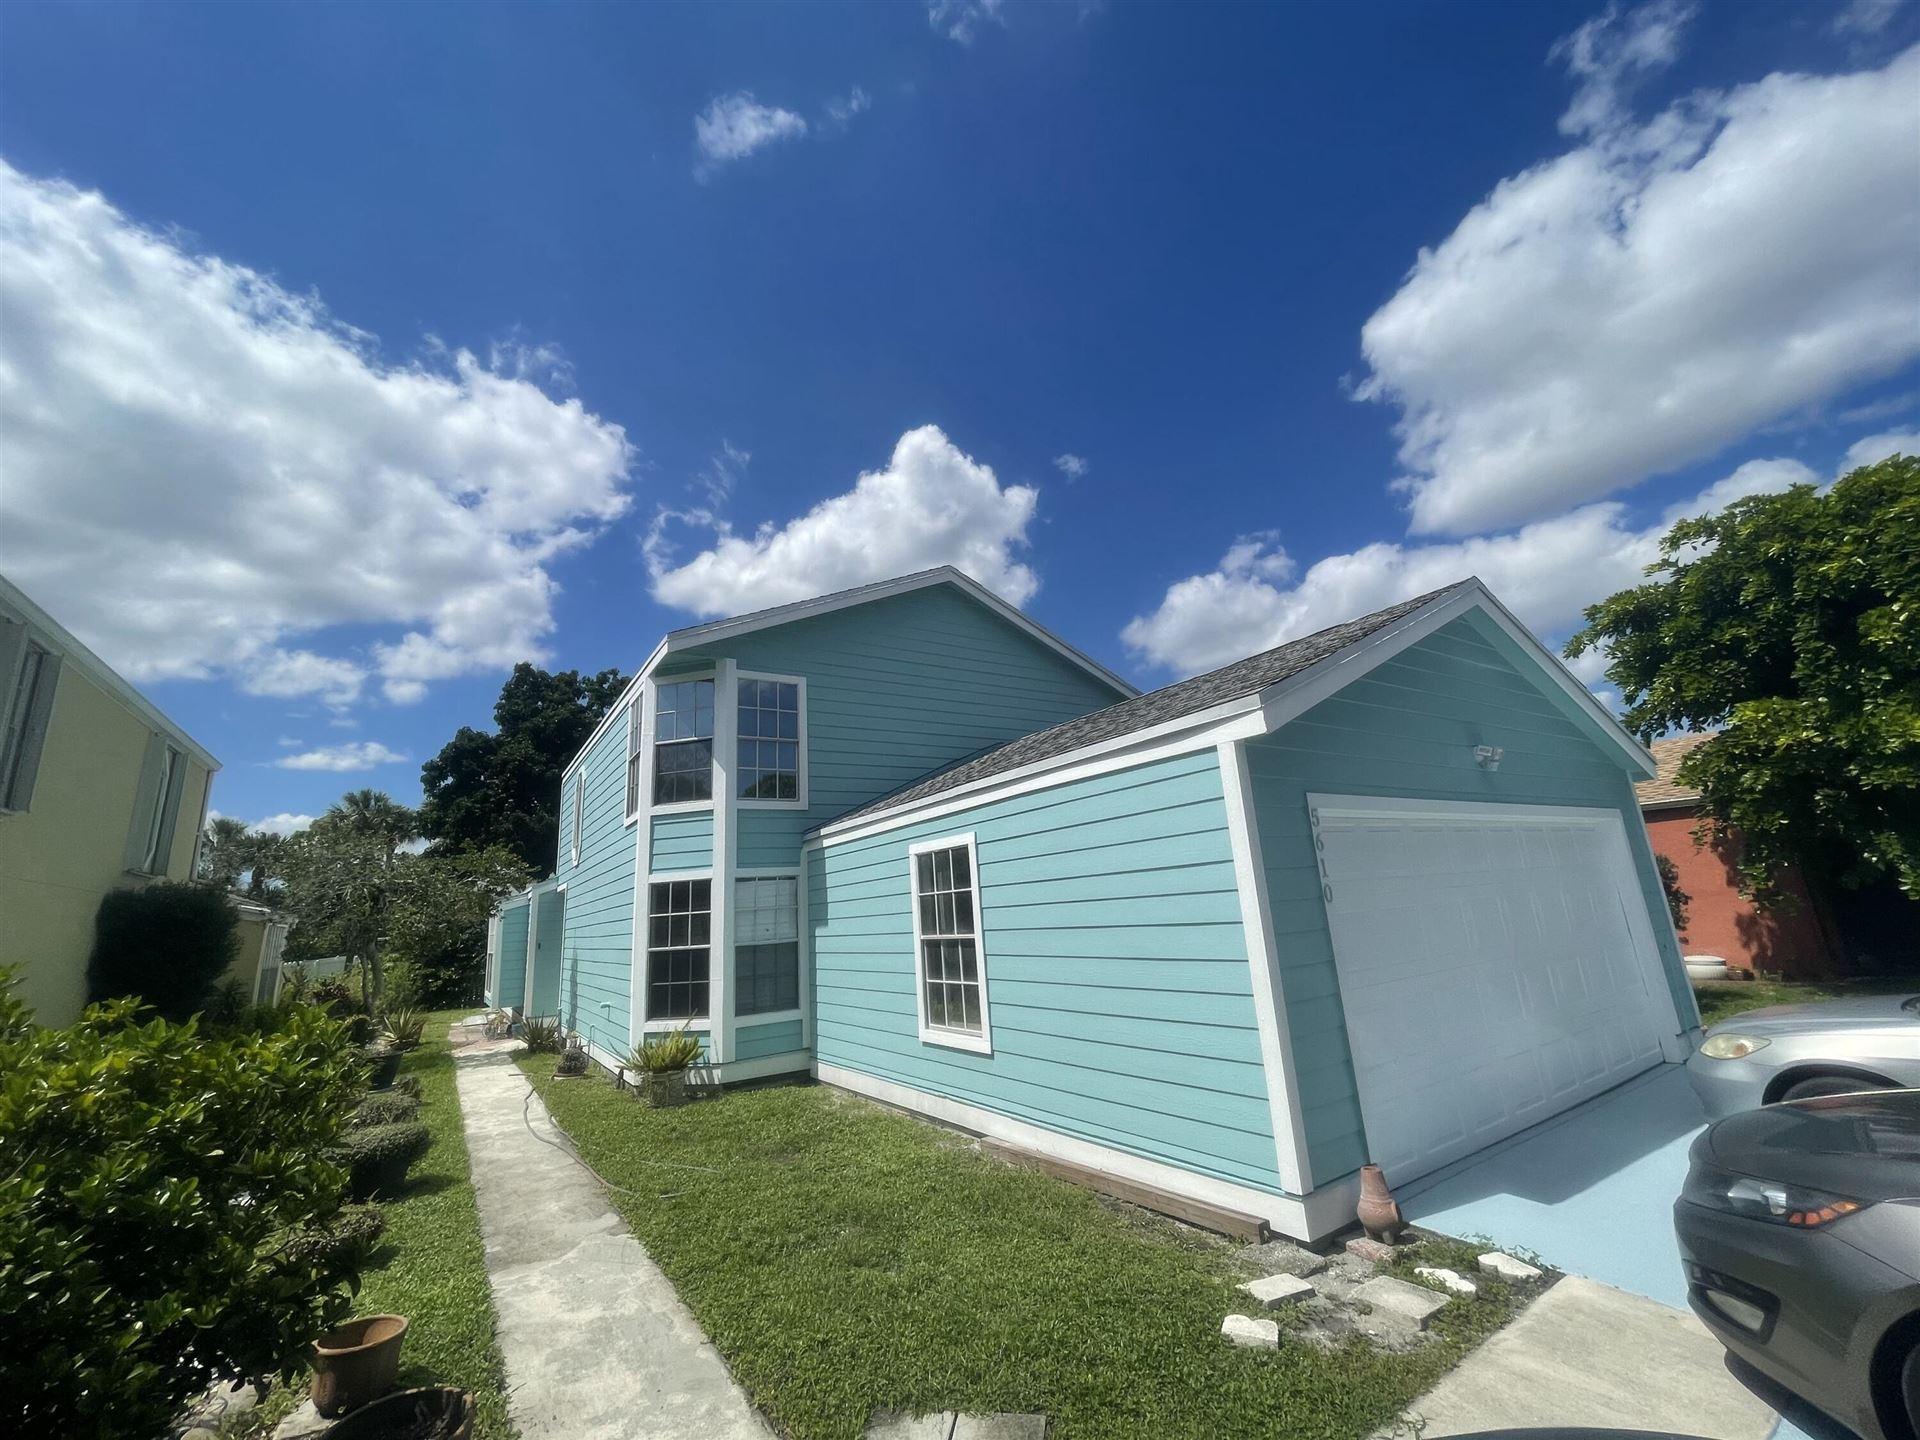 5610 Dewberry Way, West Palm Beach, FL 33415 - MLS#: RX-10749673